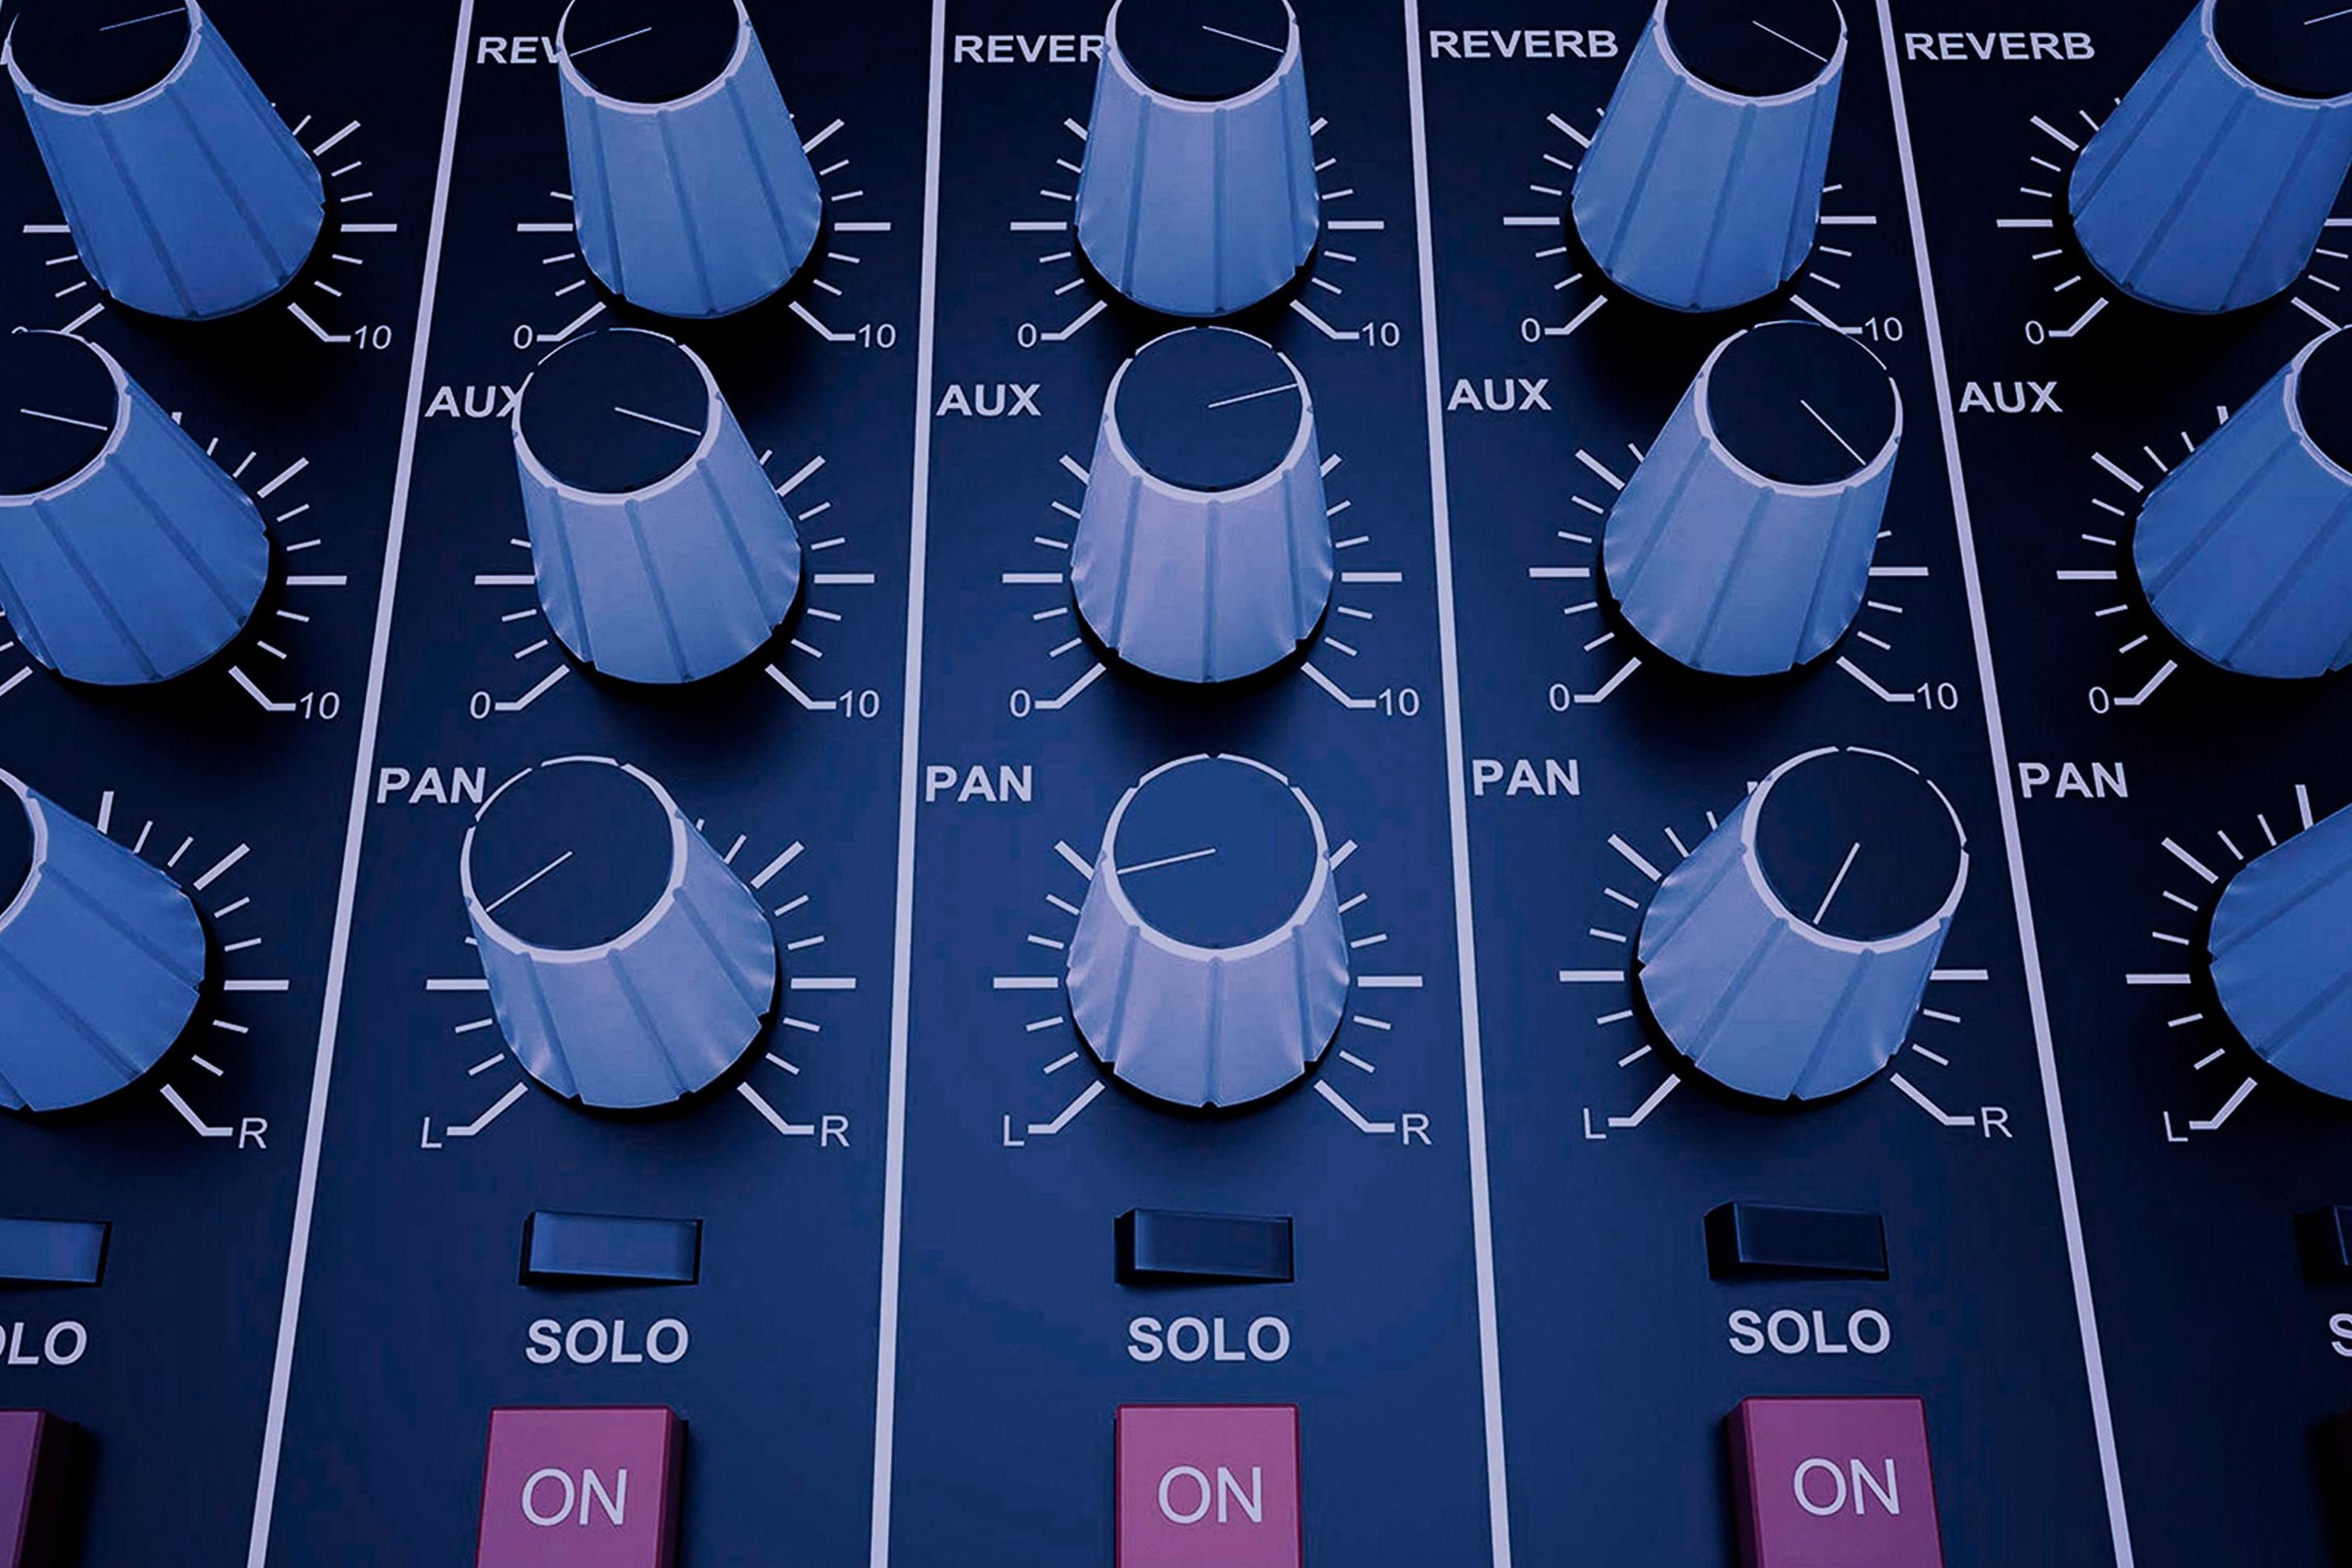 mixage-list-4